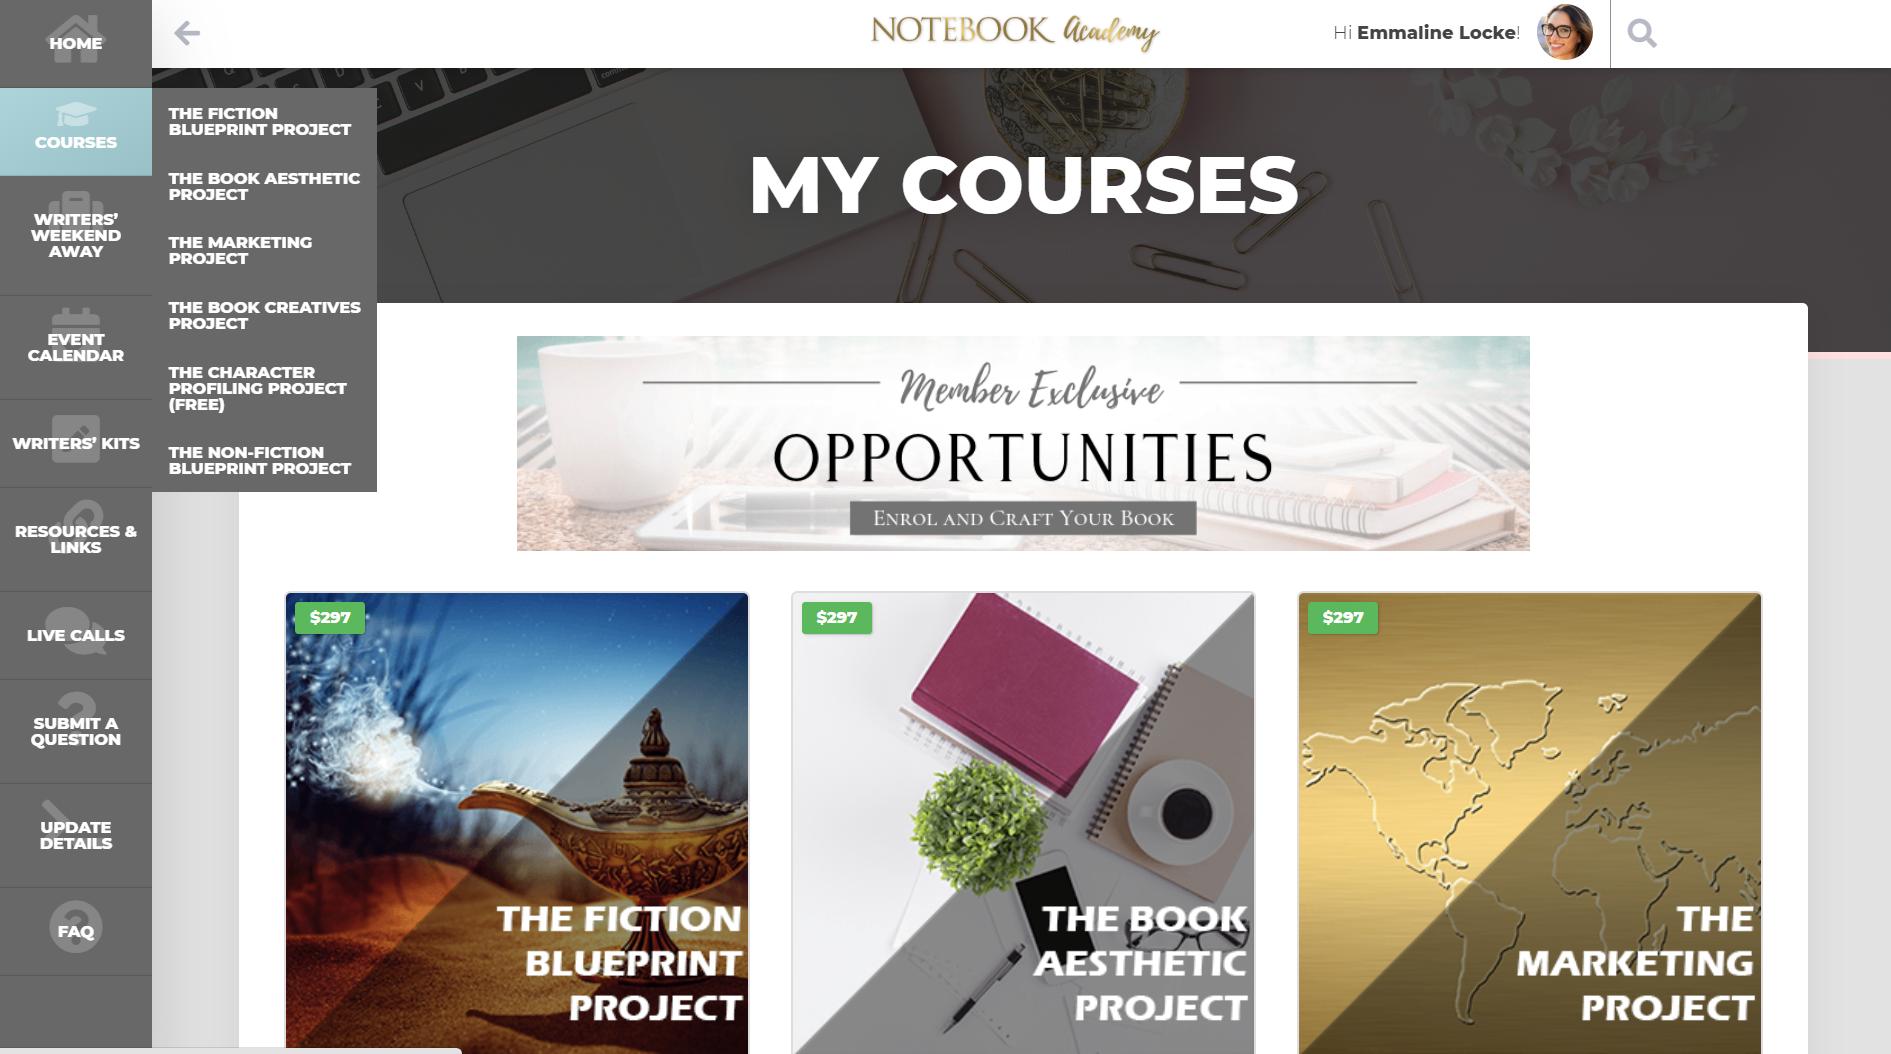 Notebook Academy Portal